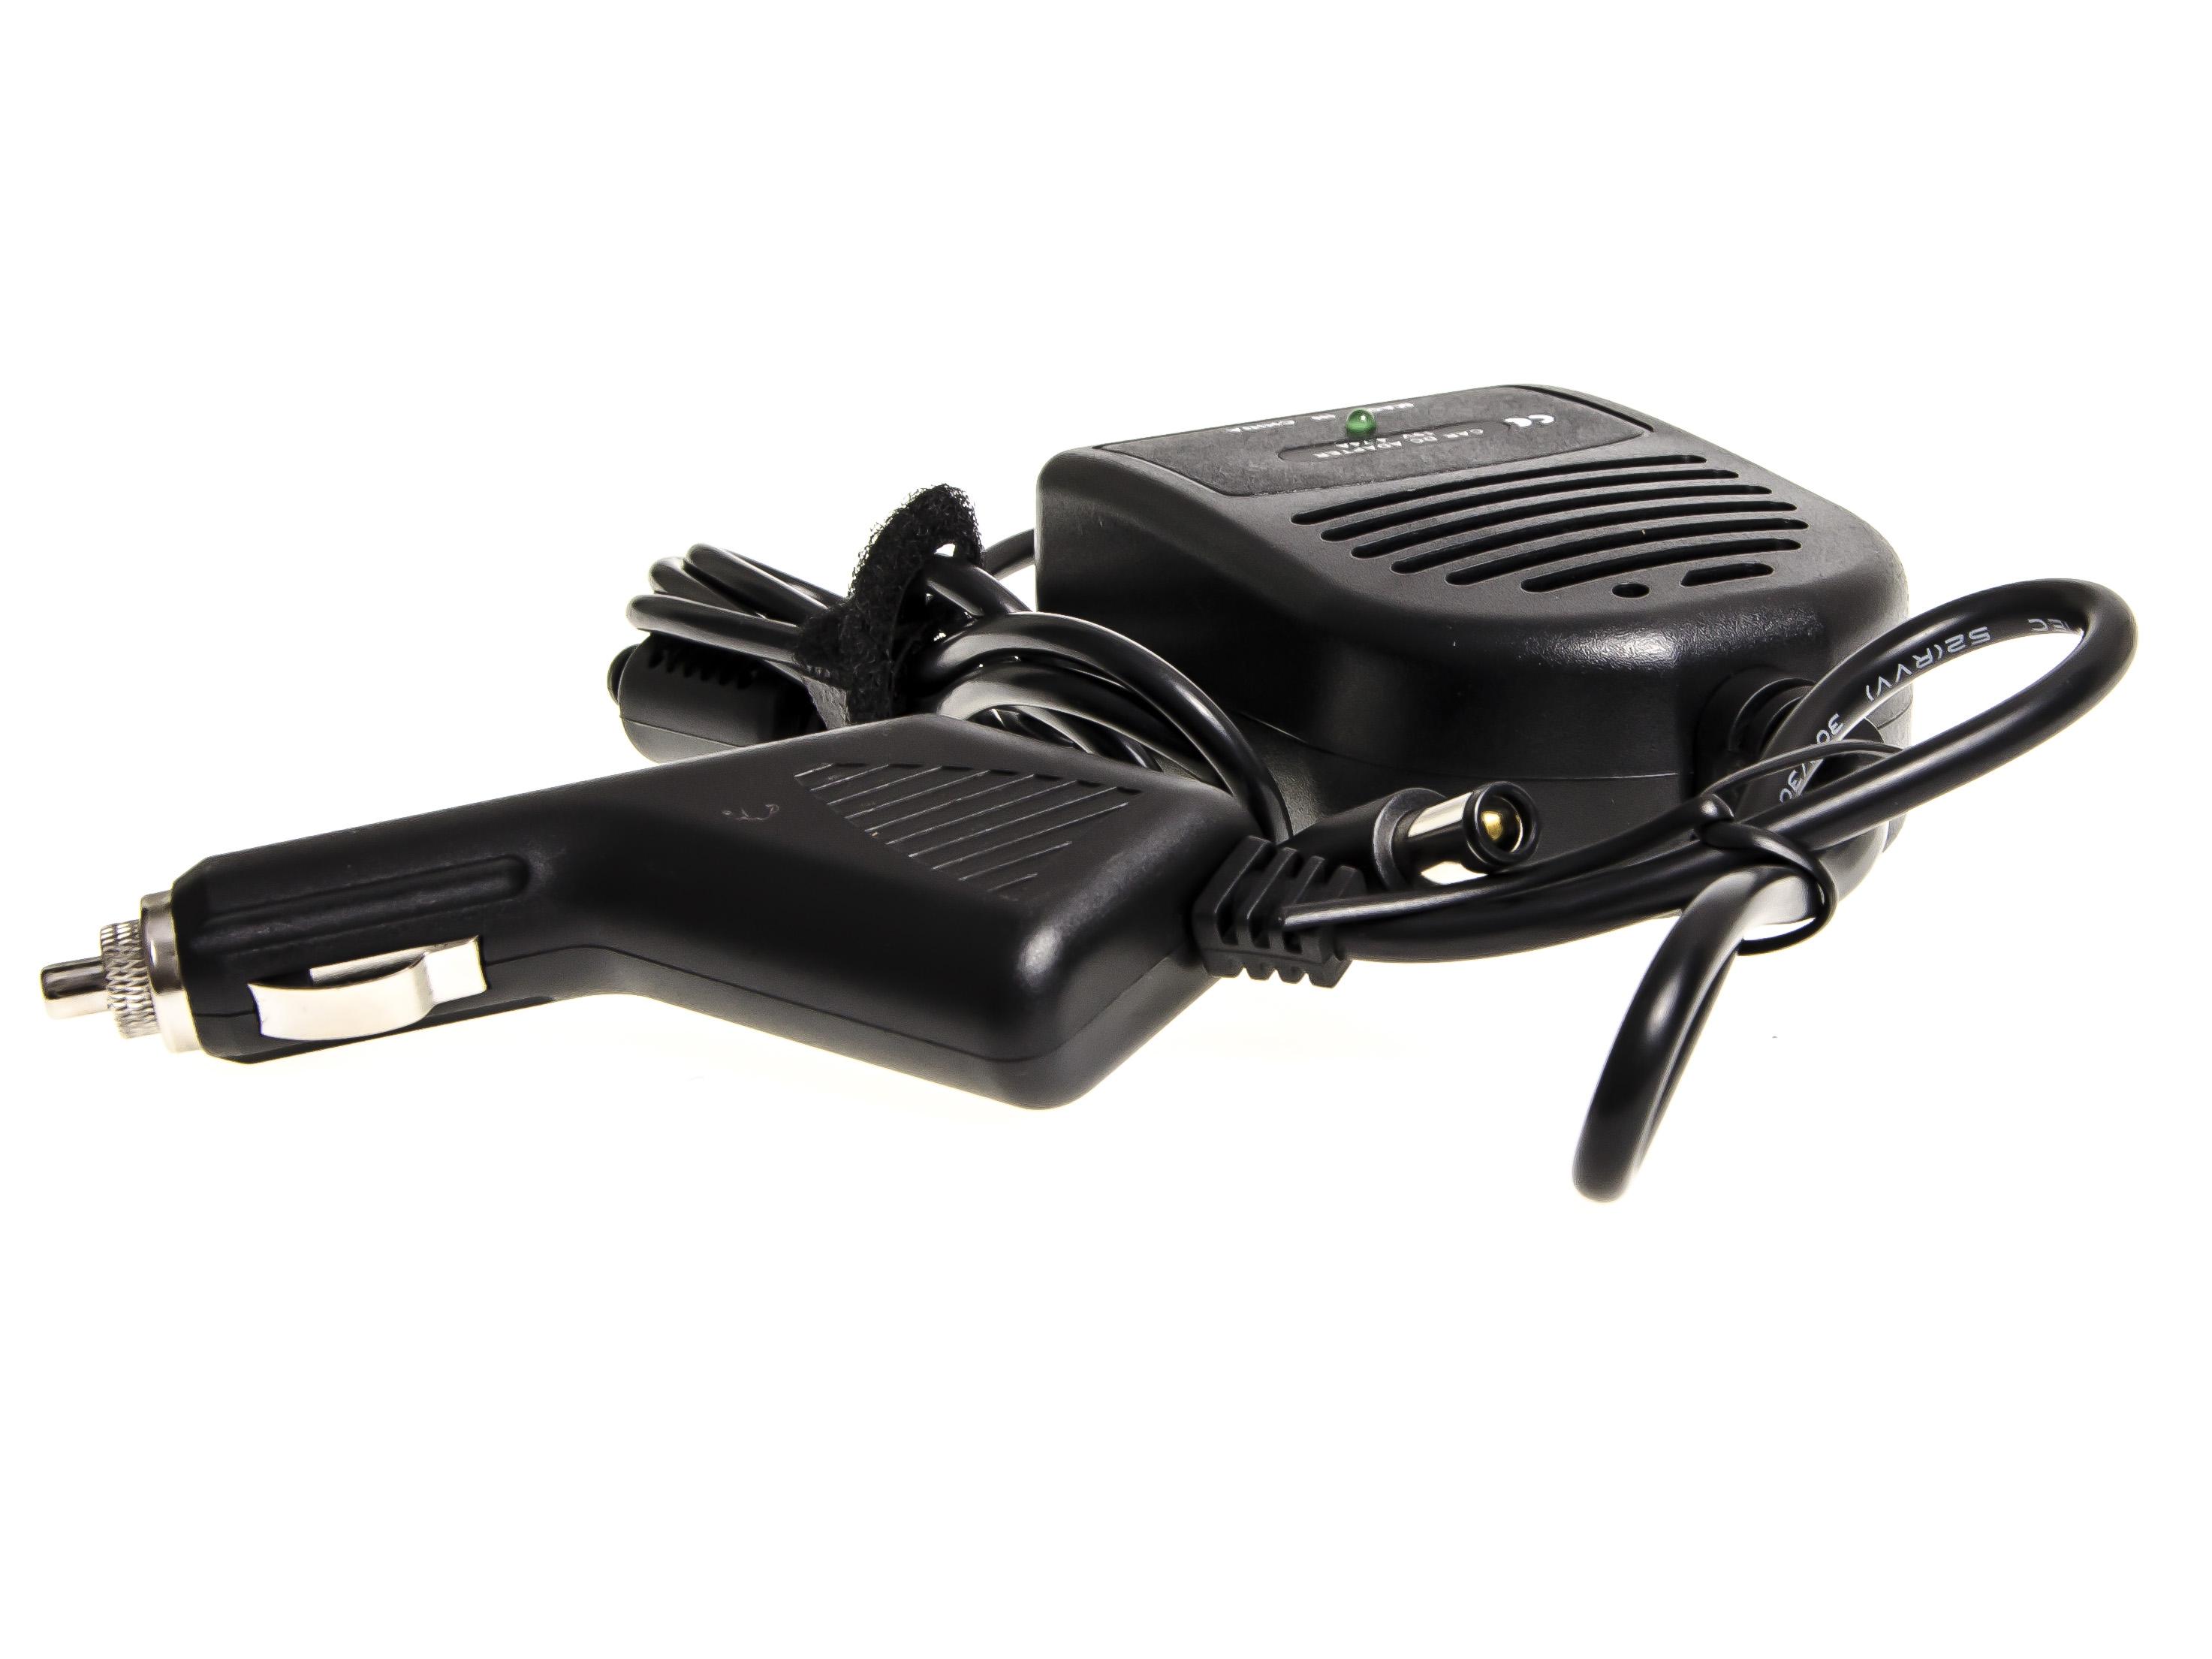 AUTO-caricabatterie-adattatore-per-HP-Compaq-Presario-cq40-331tu-cq40-332tu-Laptop